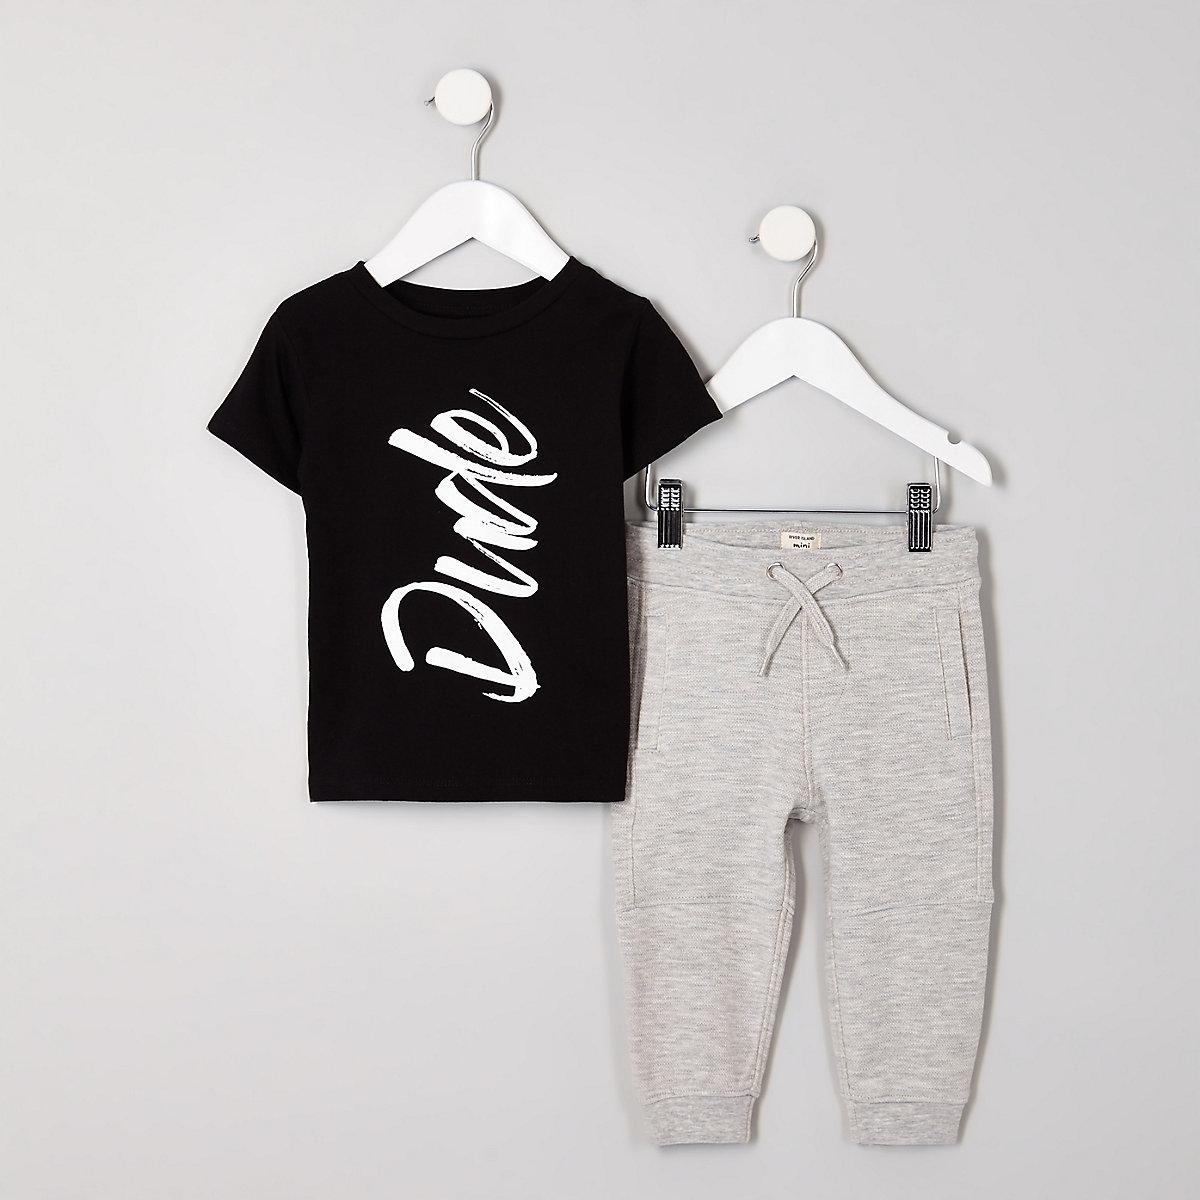 Mini boys black 'dude' T-shirt outfit